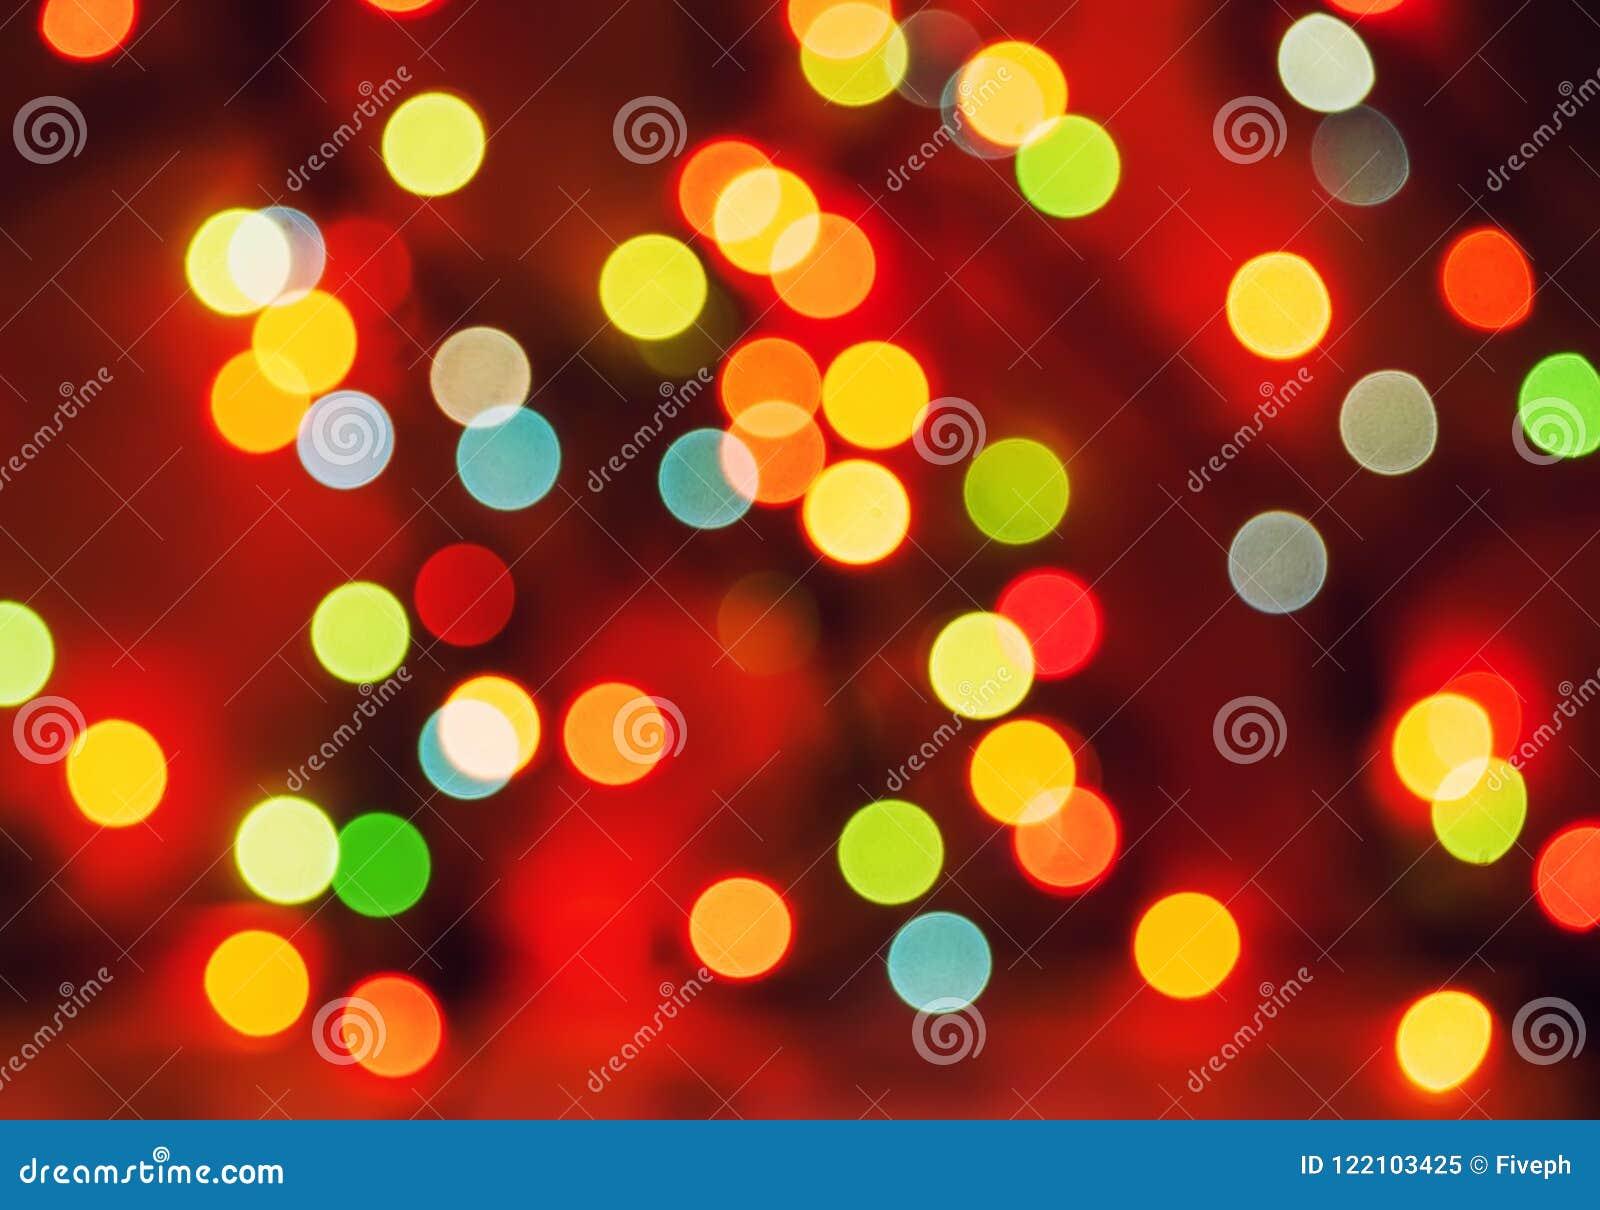 download multicolored defocused bokeh blurry lights christmas lights fe stock image image of - Blurry Christmas Lights